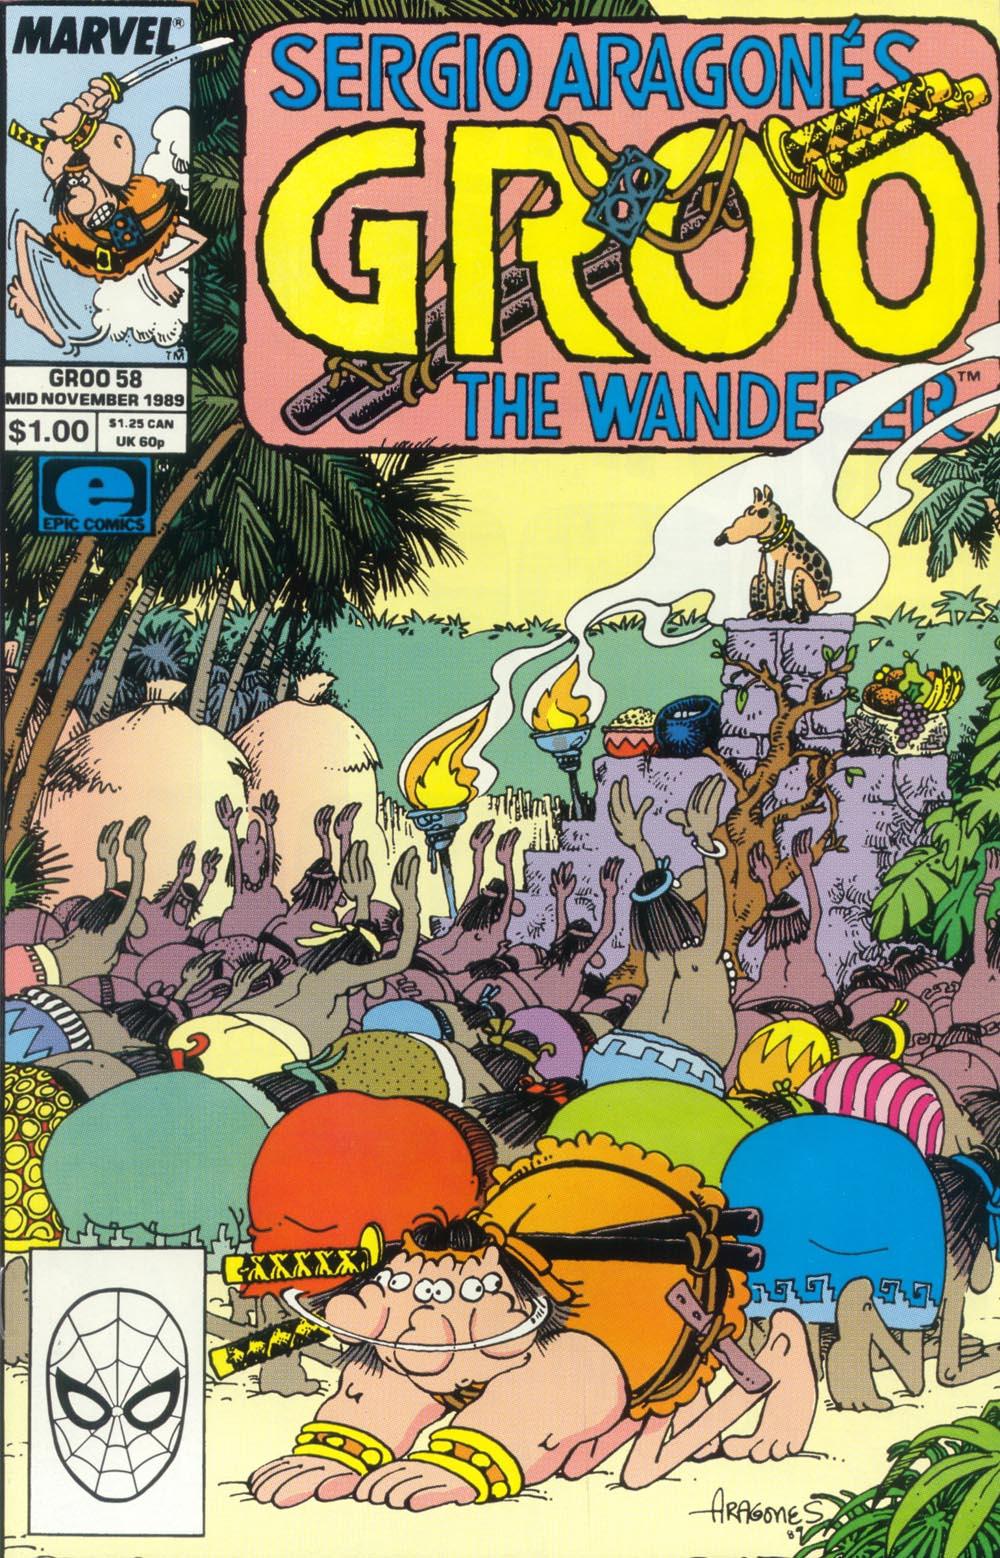 Read online Sergio Aragonés Groo the Wanderer comic -  Issue #58 - 1